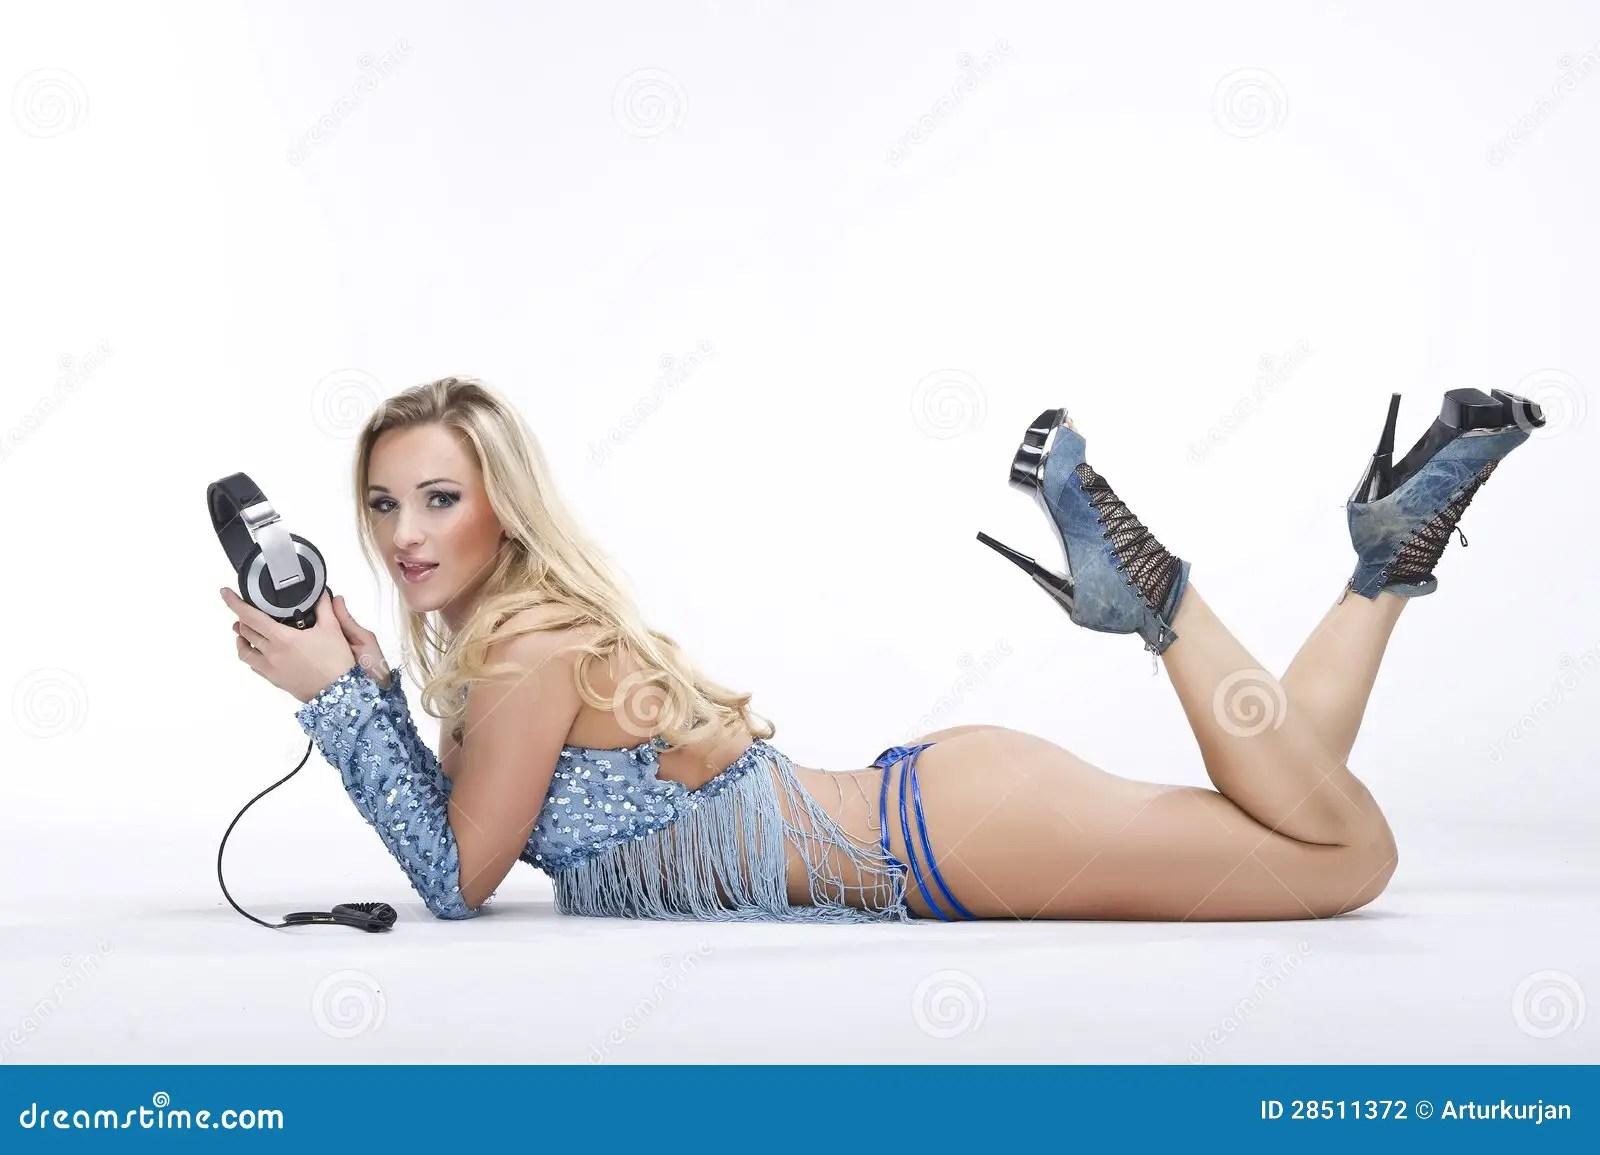 3d Dj Wallpaper Free Download Fashion Stylish Young Women Dj On White Background Stock